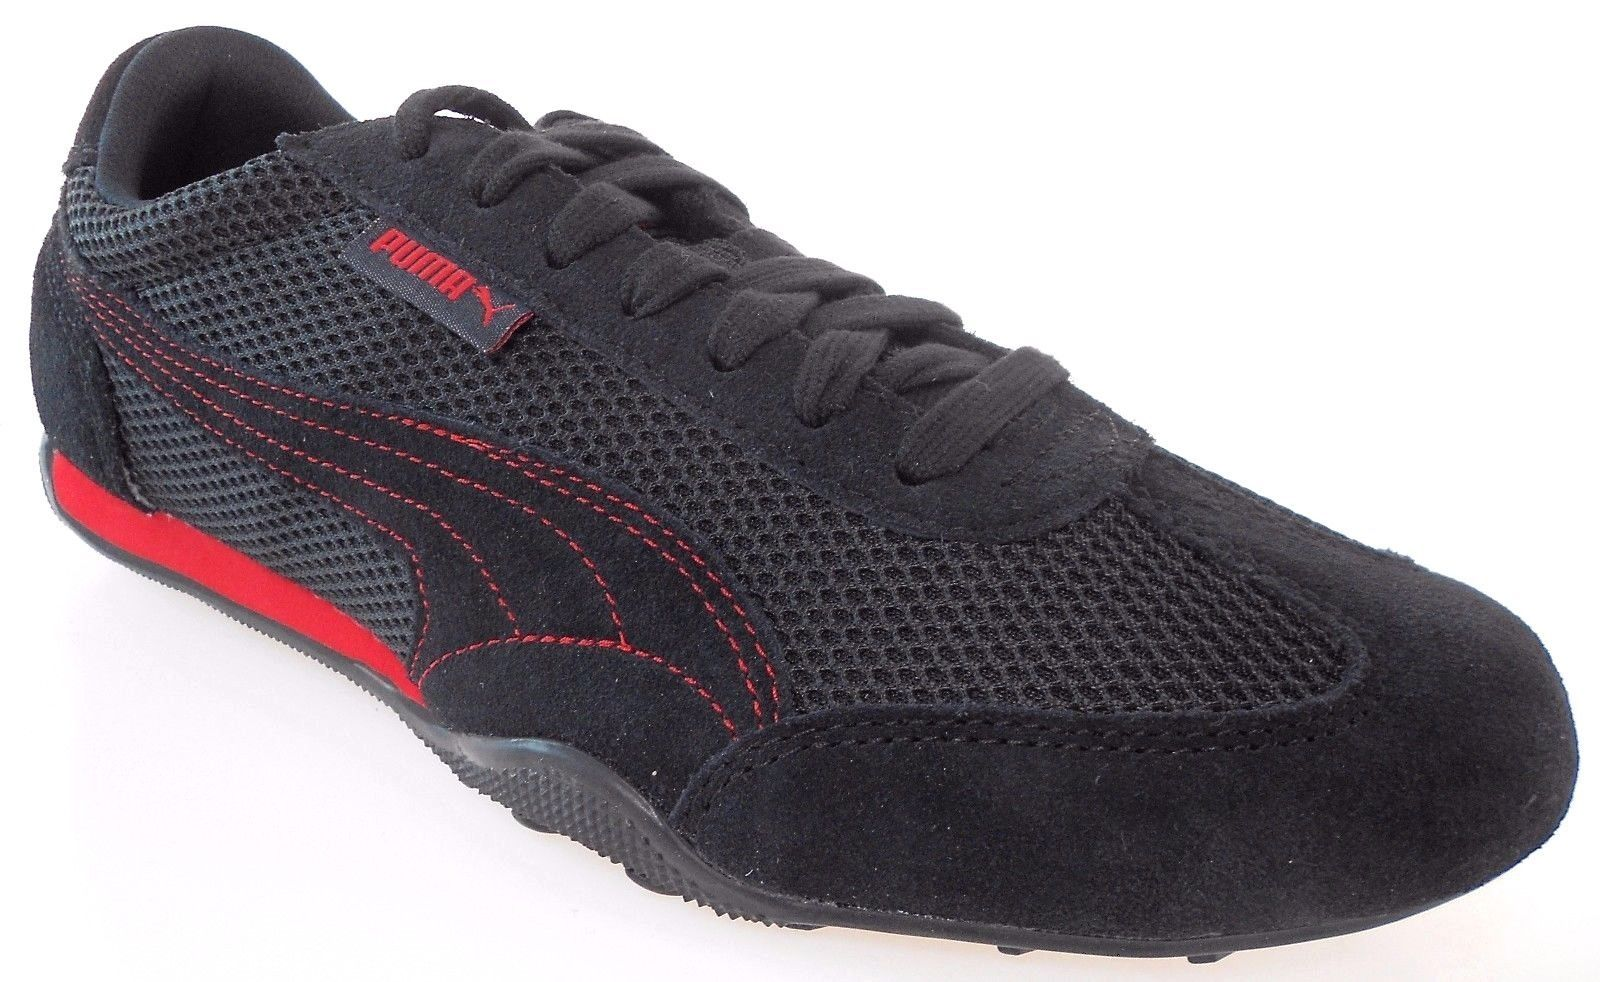 e11cc0b1c654 Puma 76 Runner Mesh Men s BLACK RED Shoes and 50 similar items